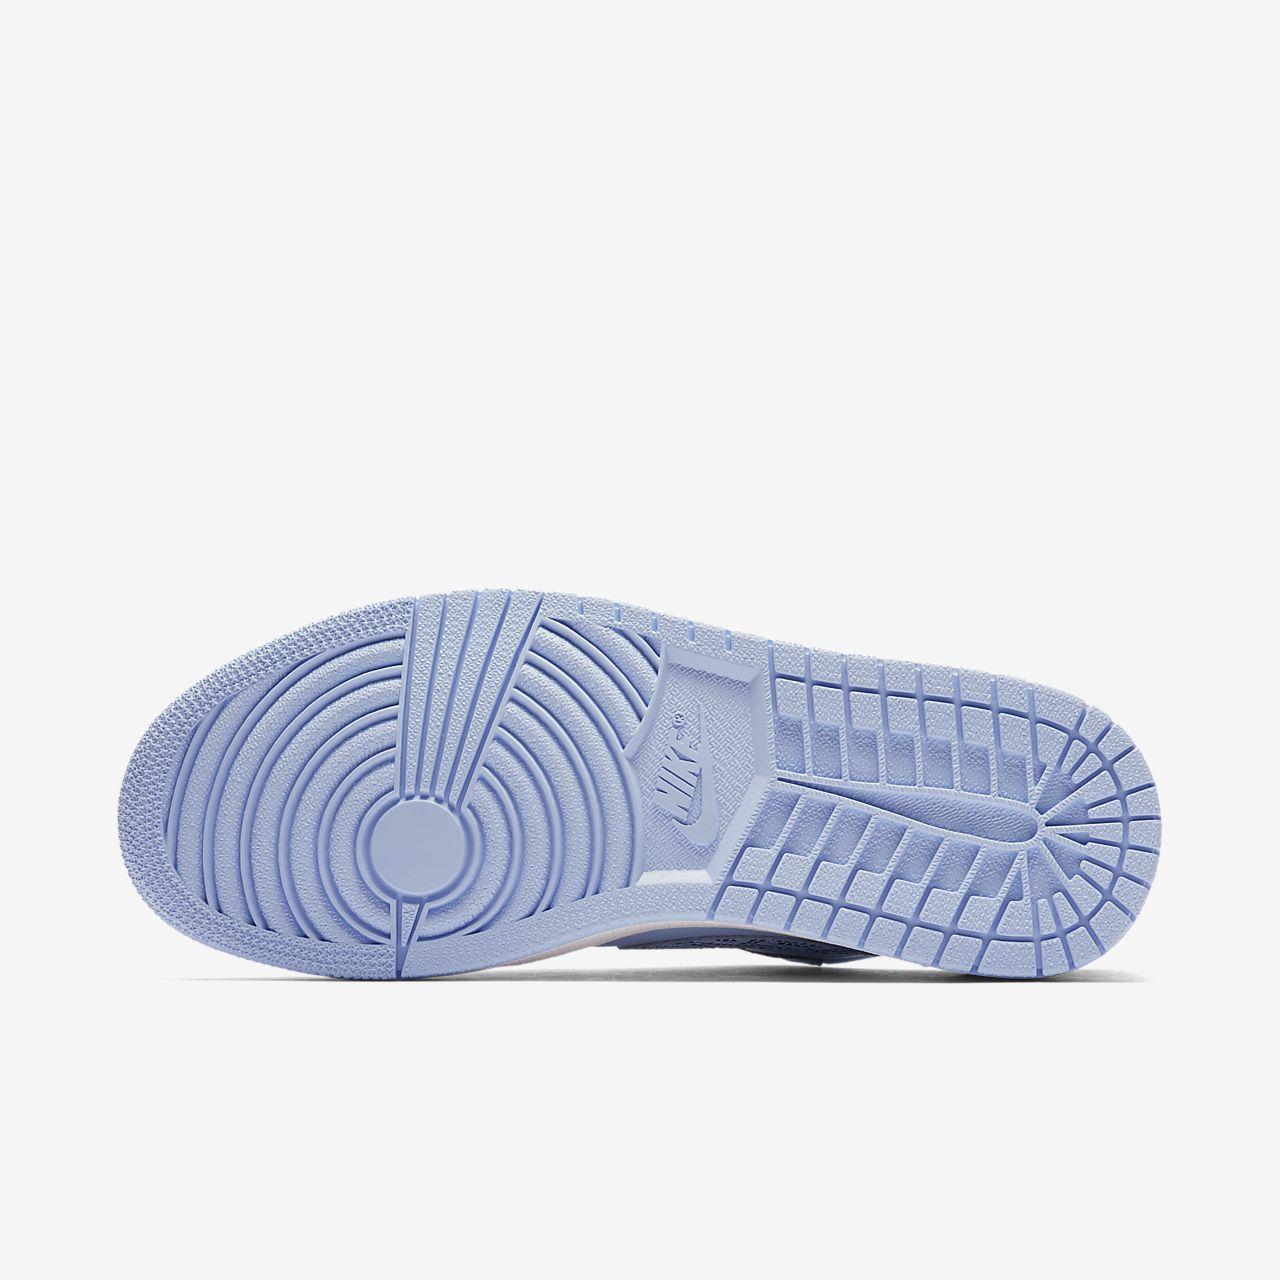 pretty nice 83265 620a5 Air Jordan 1 Retro Low OG-sko til kvinder. Nike.com DK